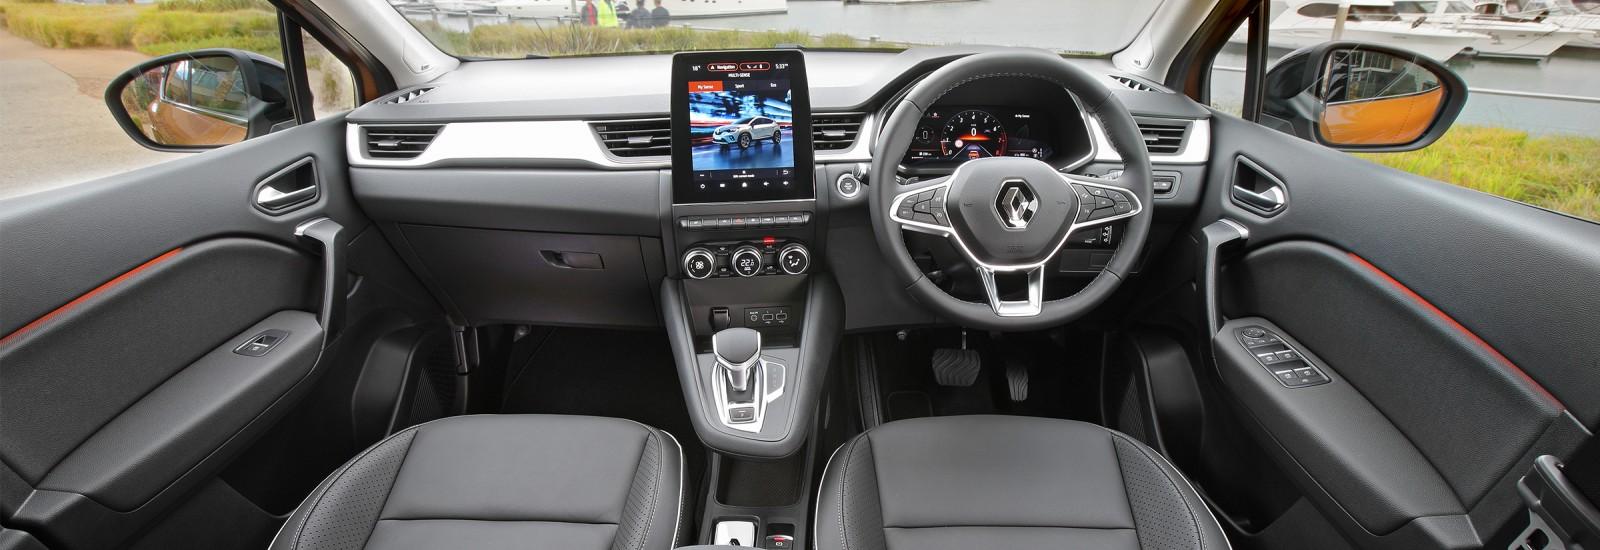 A sleek, intuitive interior